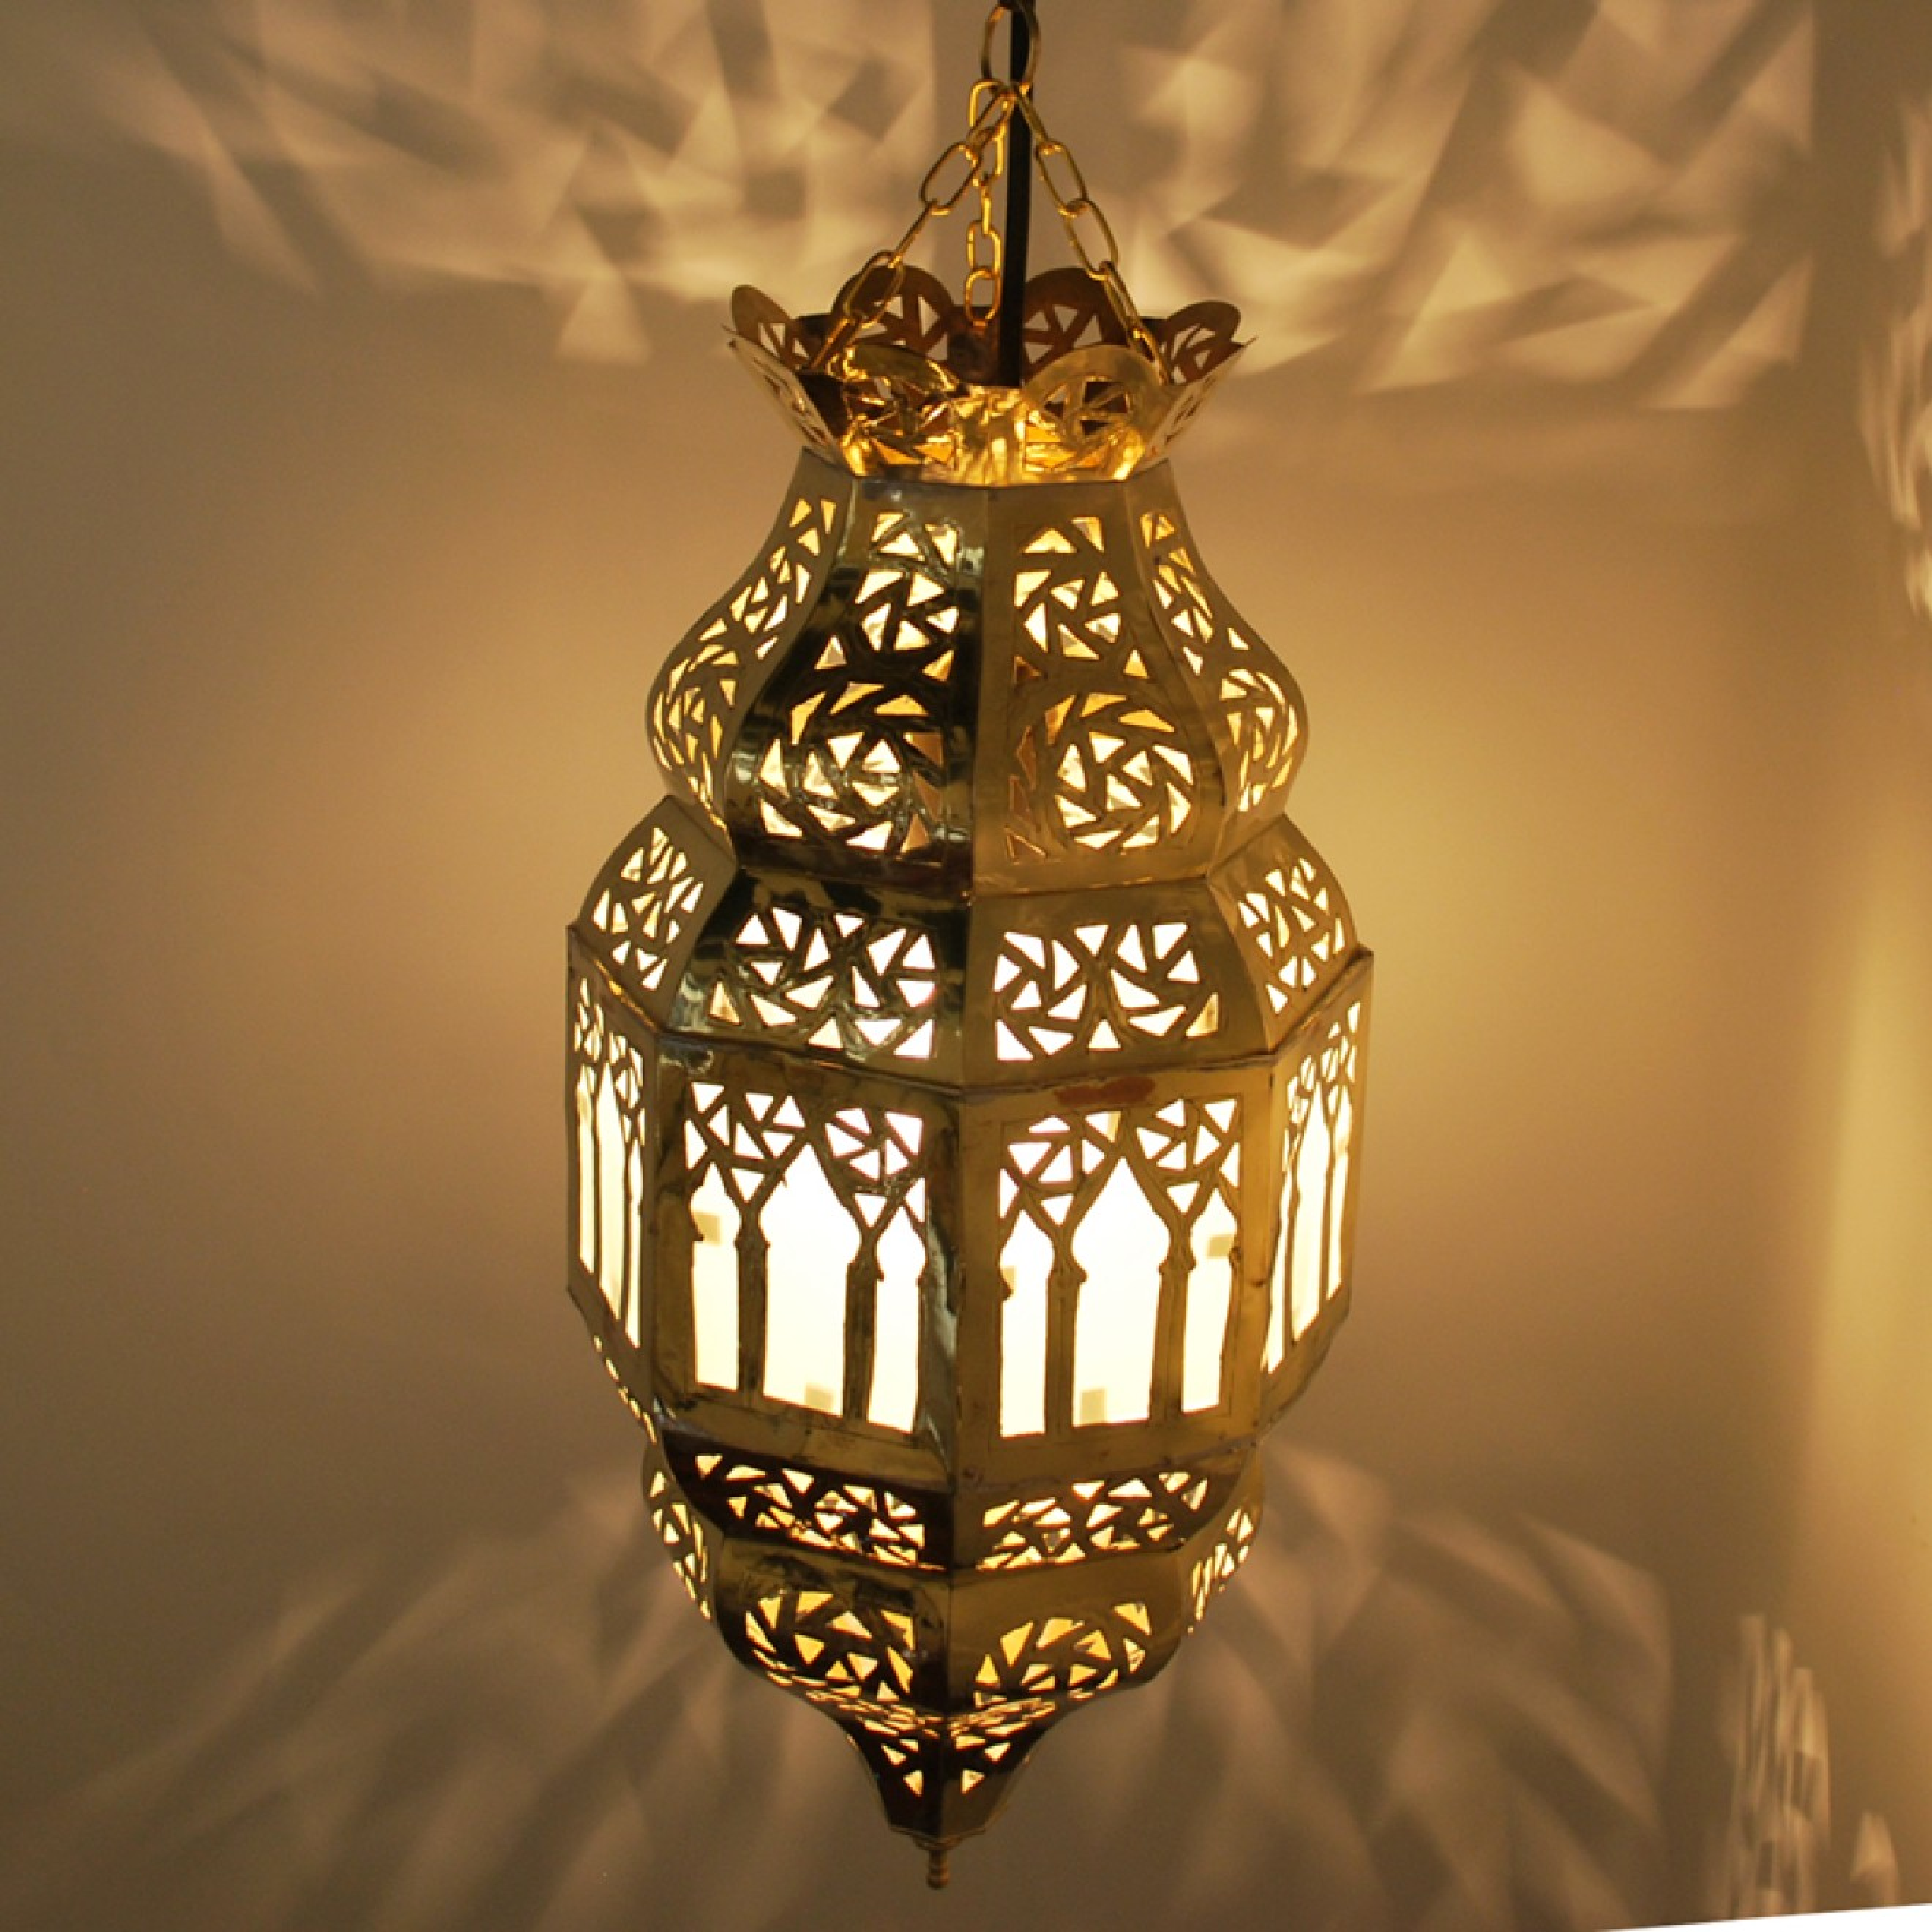 orientalische marokkanische h ngeleuchte lampe laterne moulati aus messing smash. Black Bedroom Furniture Sets. Home Design Ideas